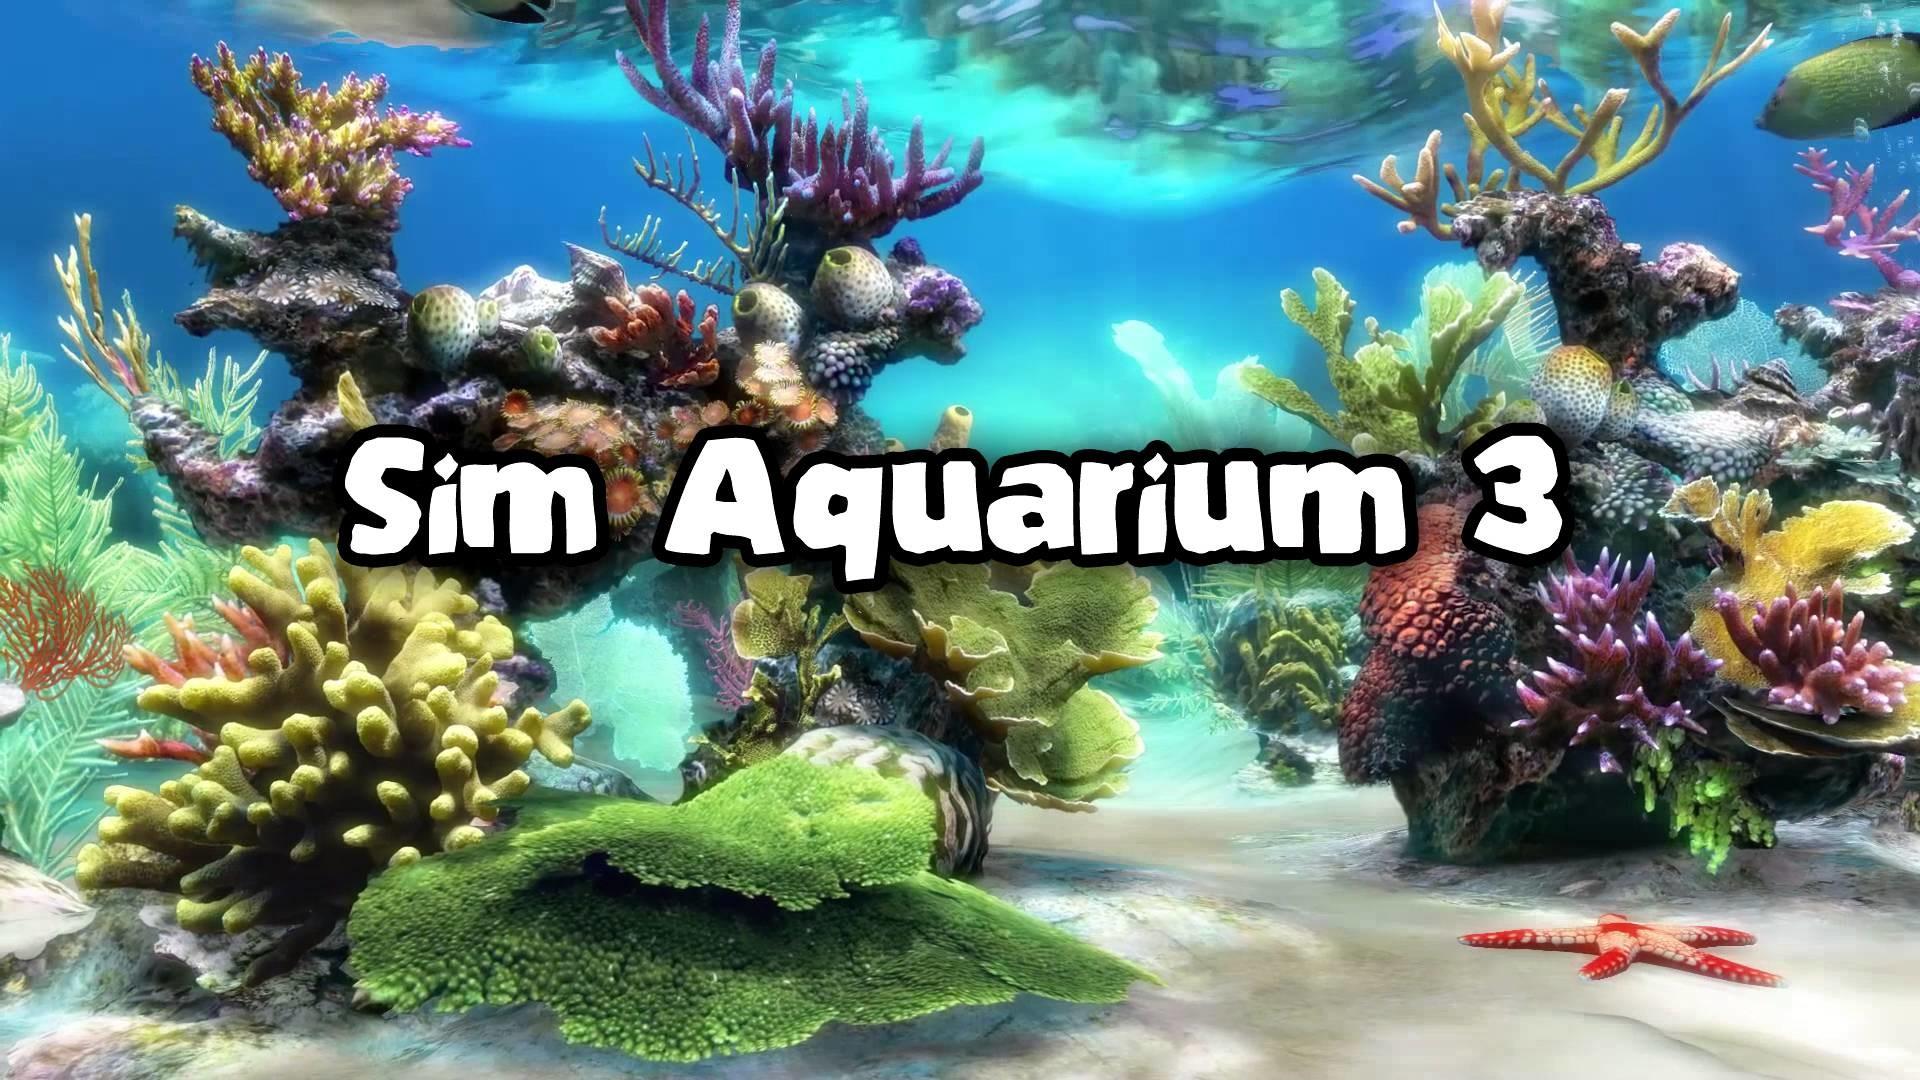 Aquarium Software on PC – My top 5